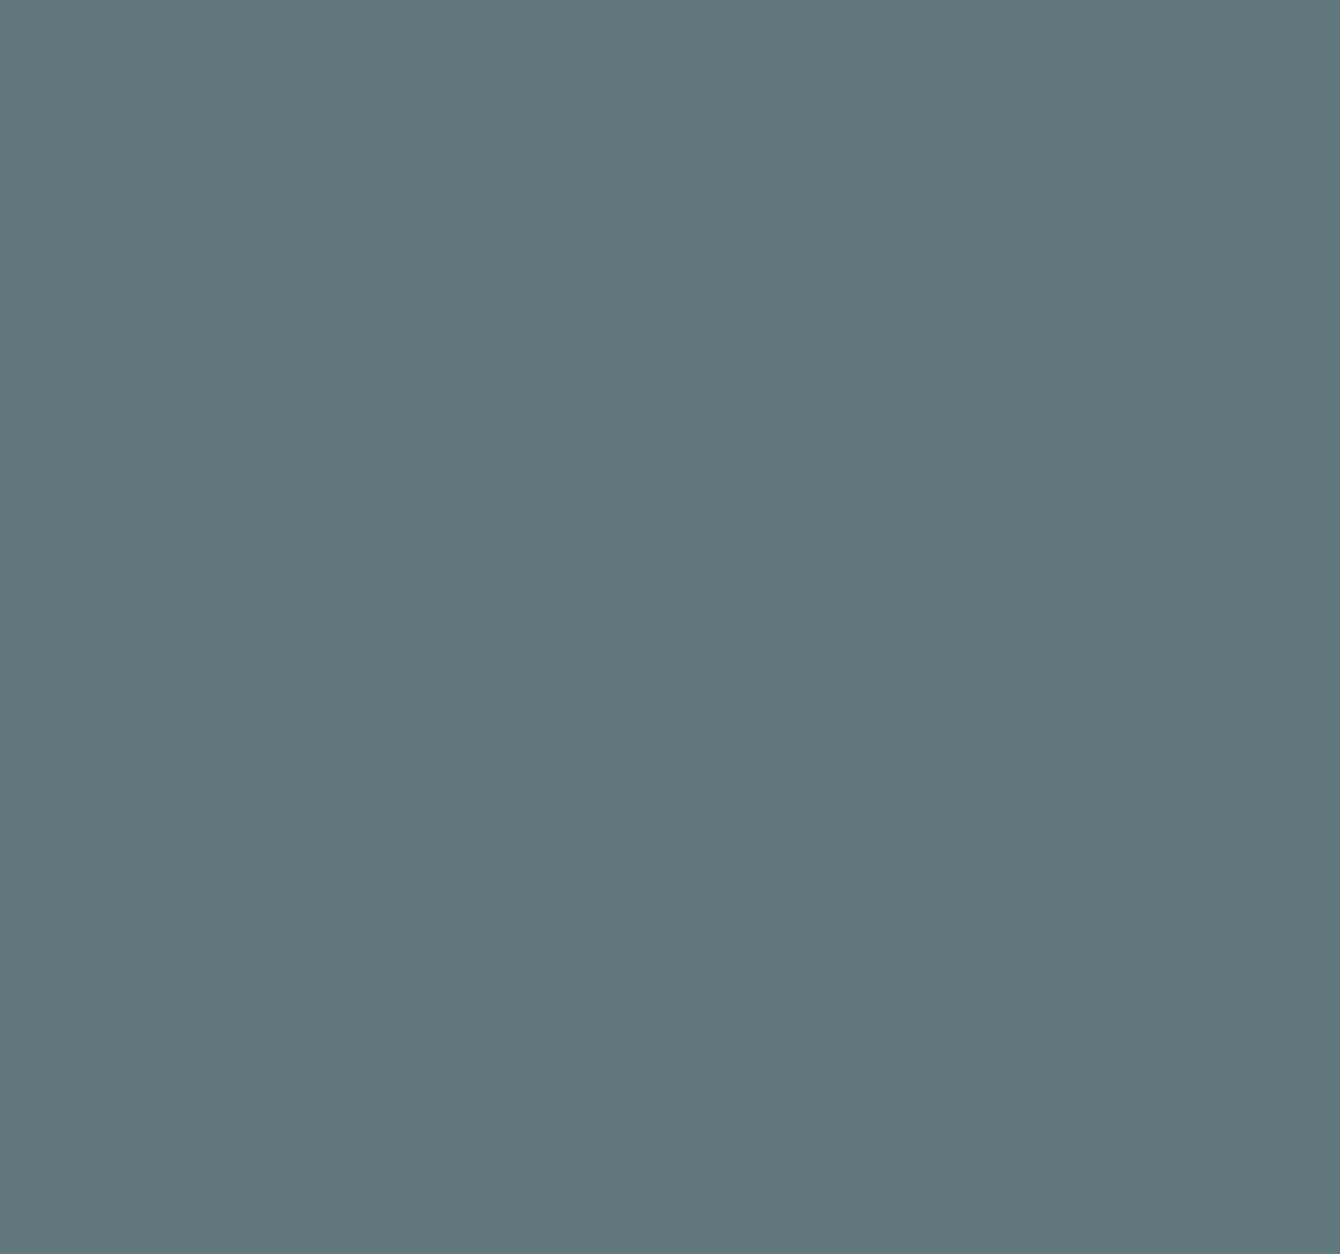 grey-blob